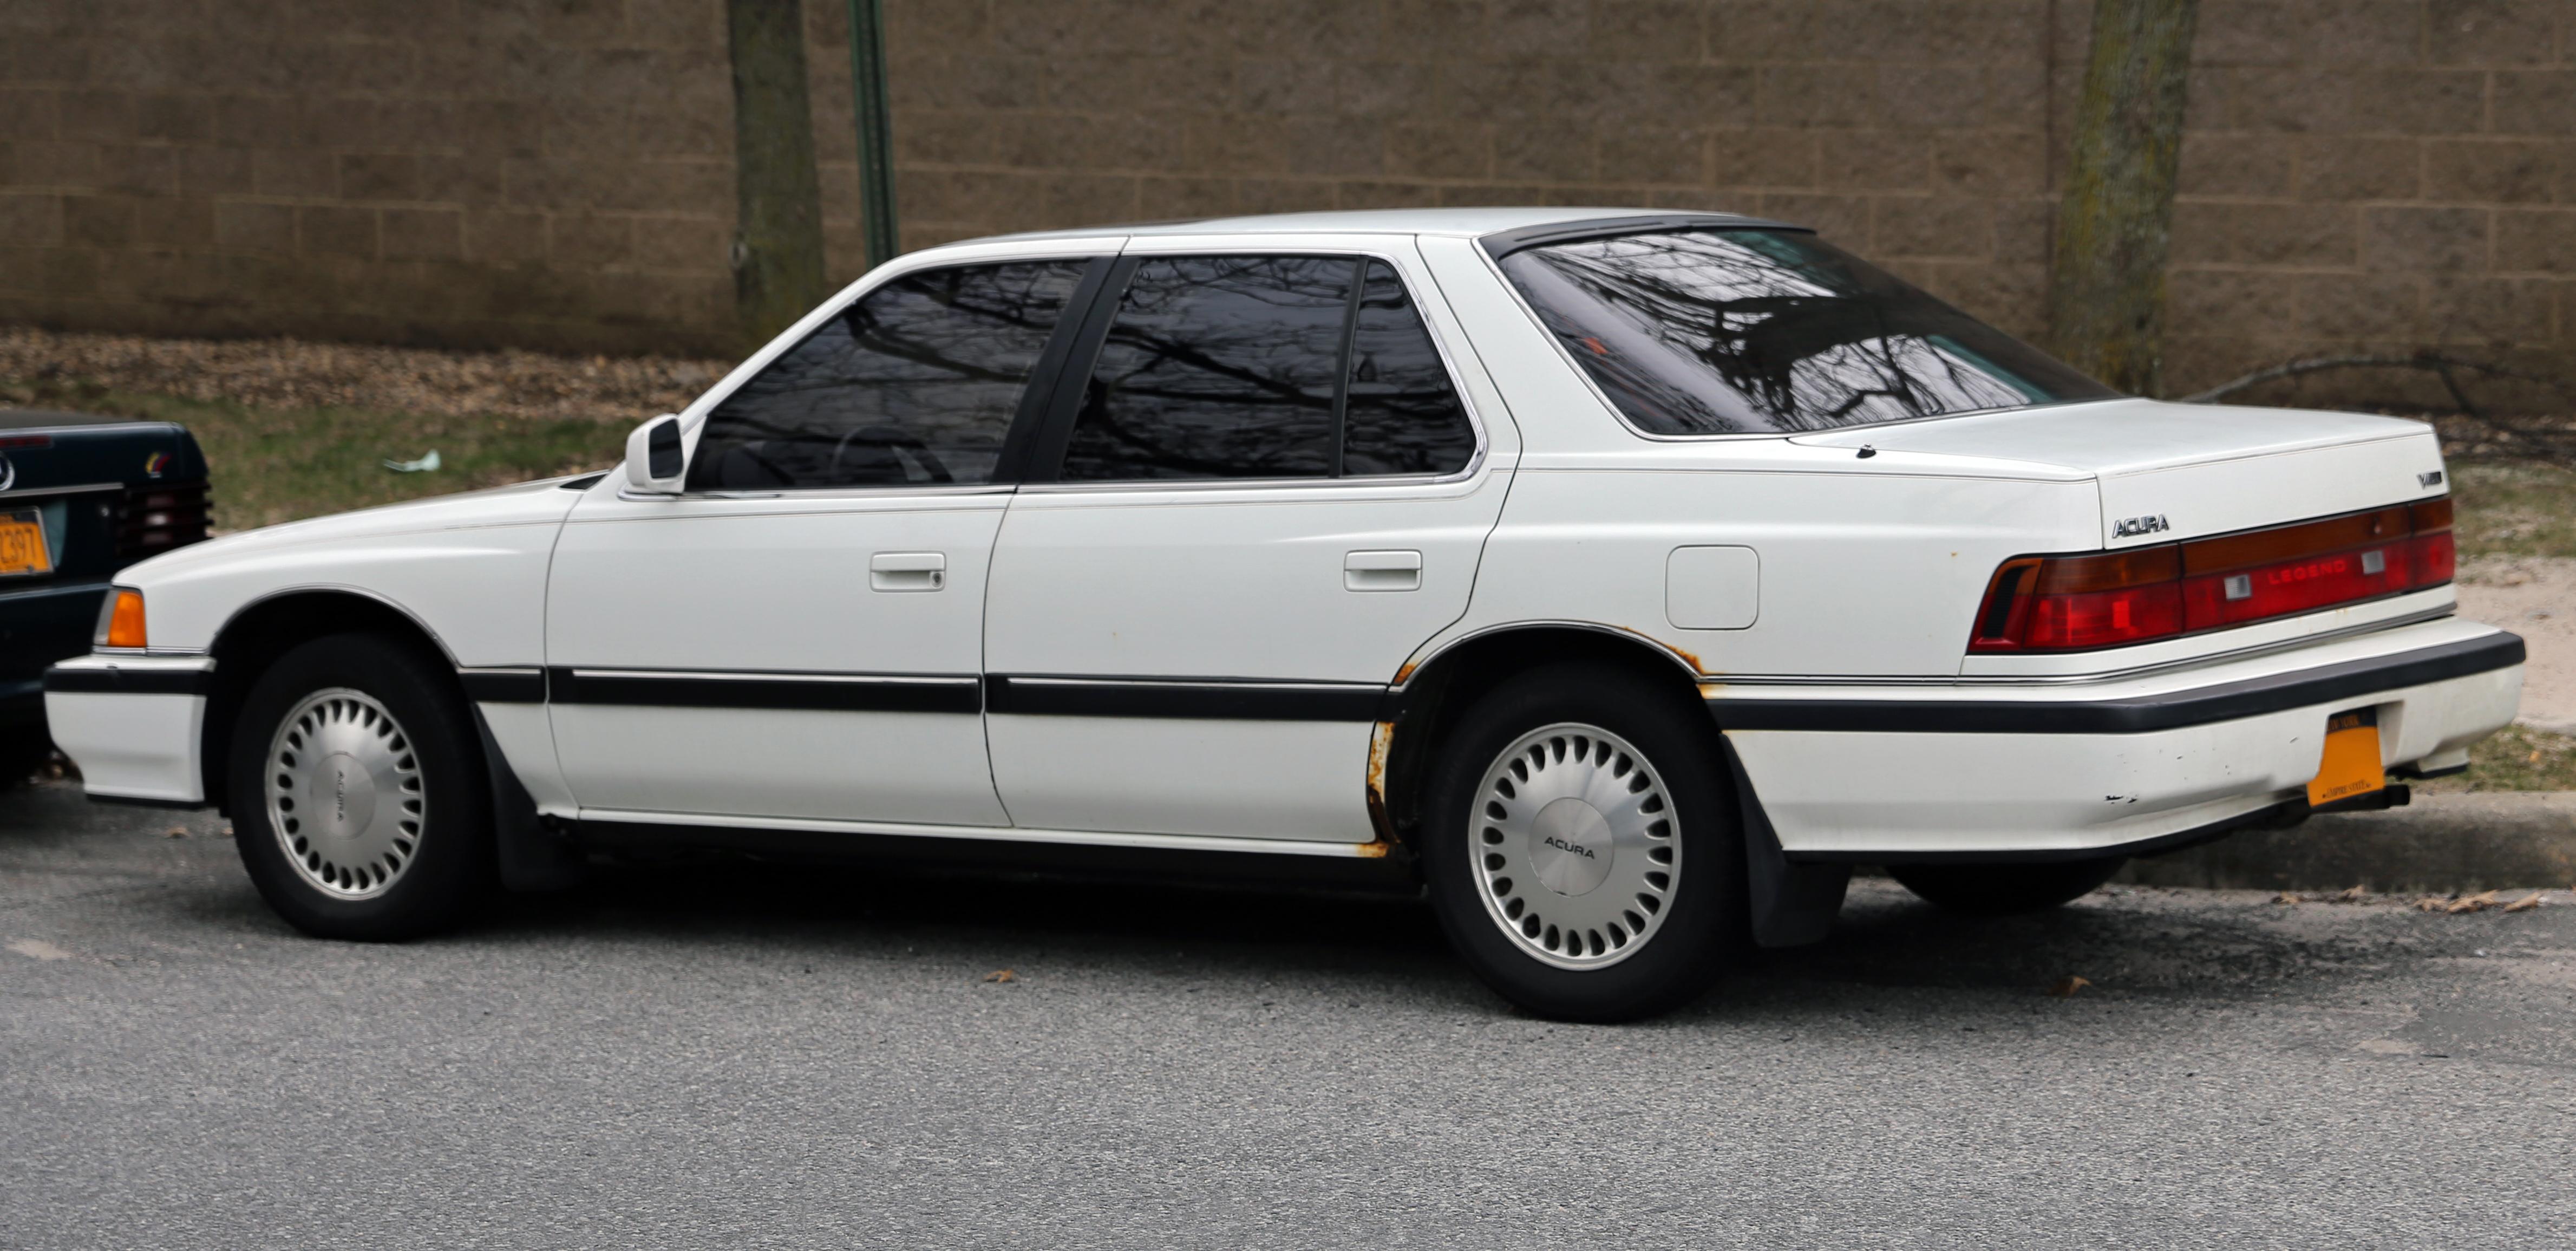 acura legend wikiwand rh wikiwand com 1997 Acura Legend 1992 Acura Legend